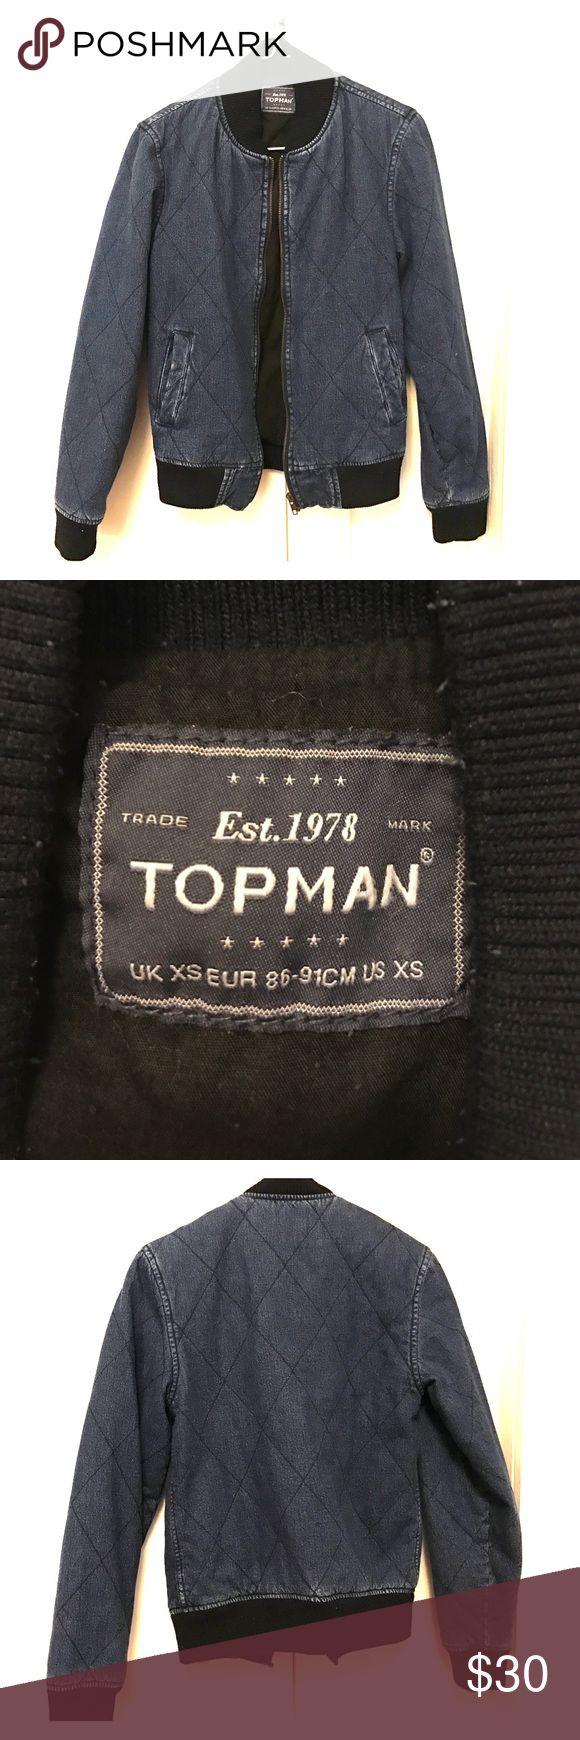 Topman Denim Bomber Topman Denim Bomber, brand new never worn, very trendy and looks cute on Topman Jackets & Coats